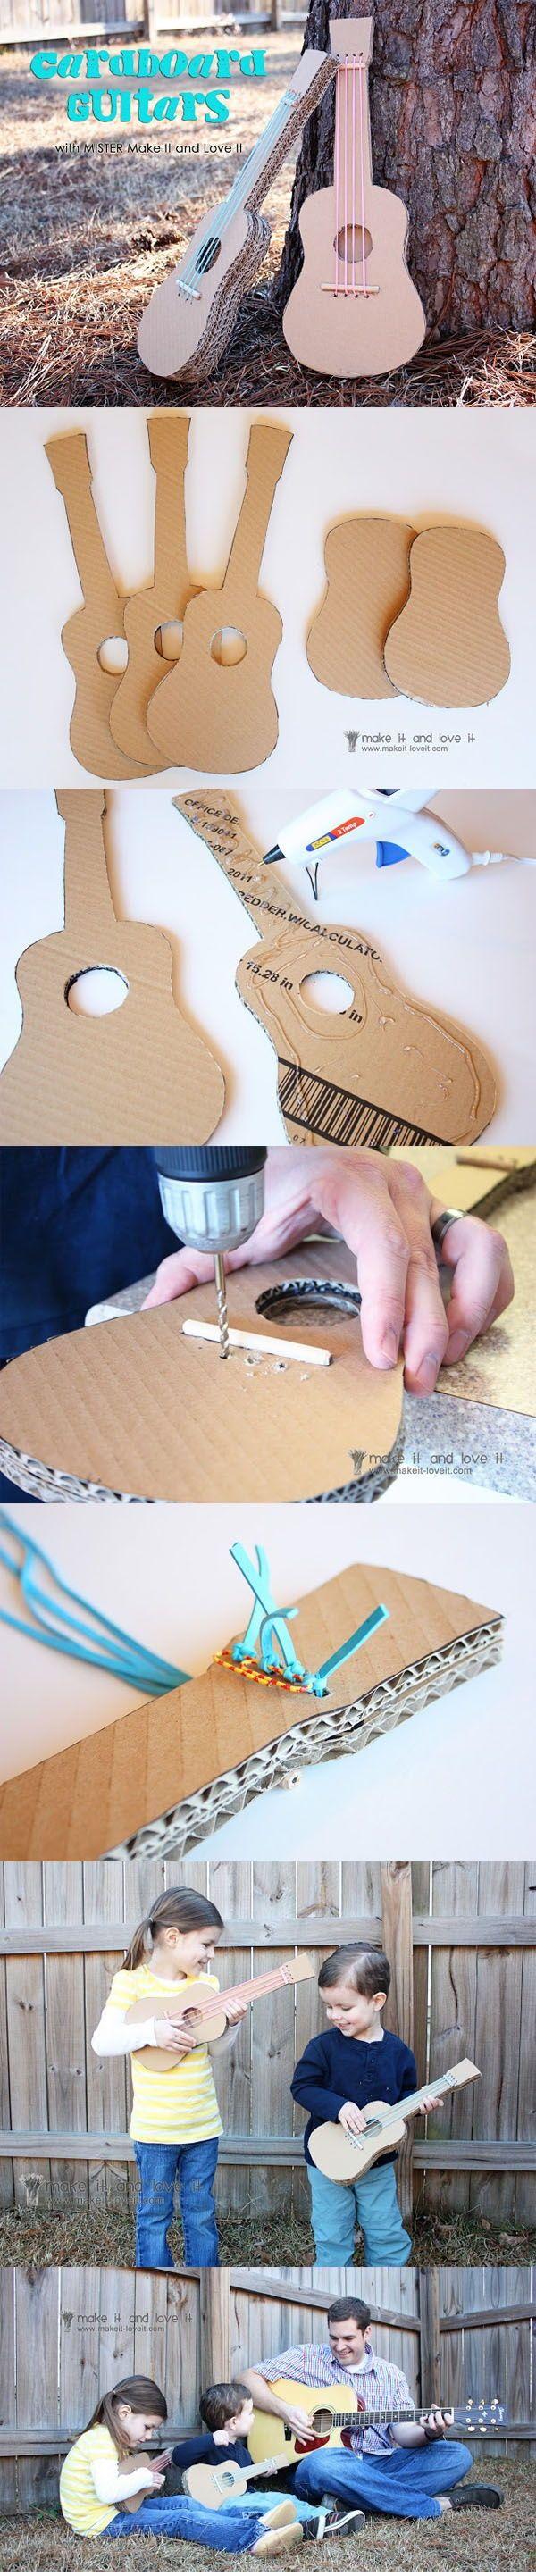 DIY Cardboard Guitar DIY Projects | UsefulDIY.com